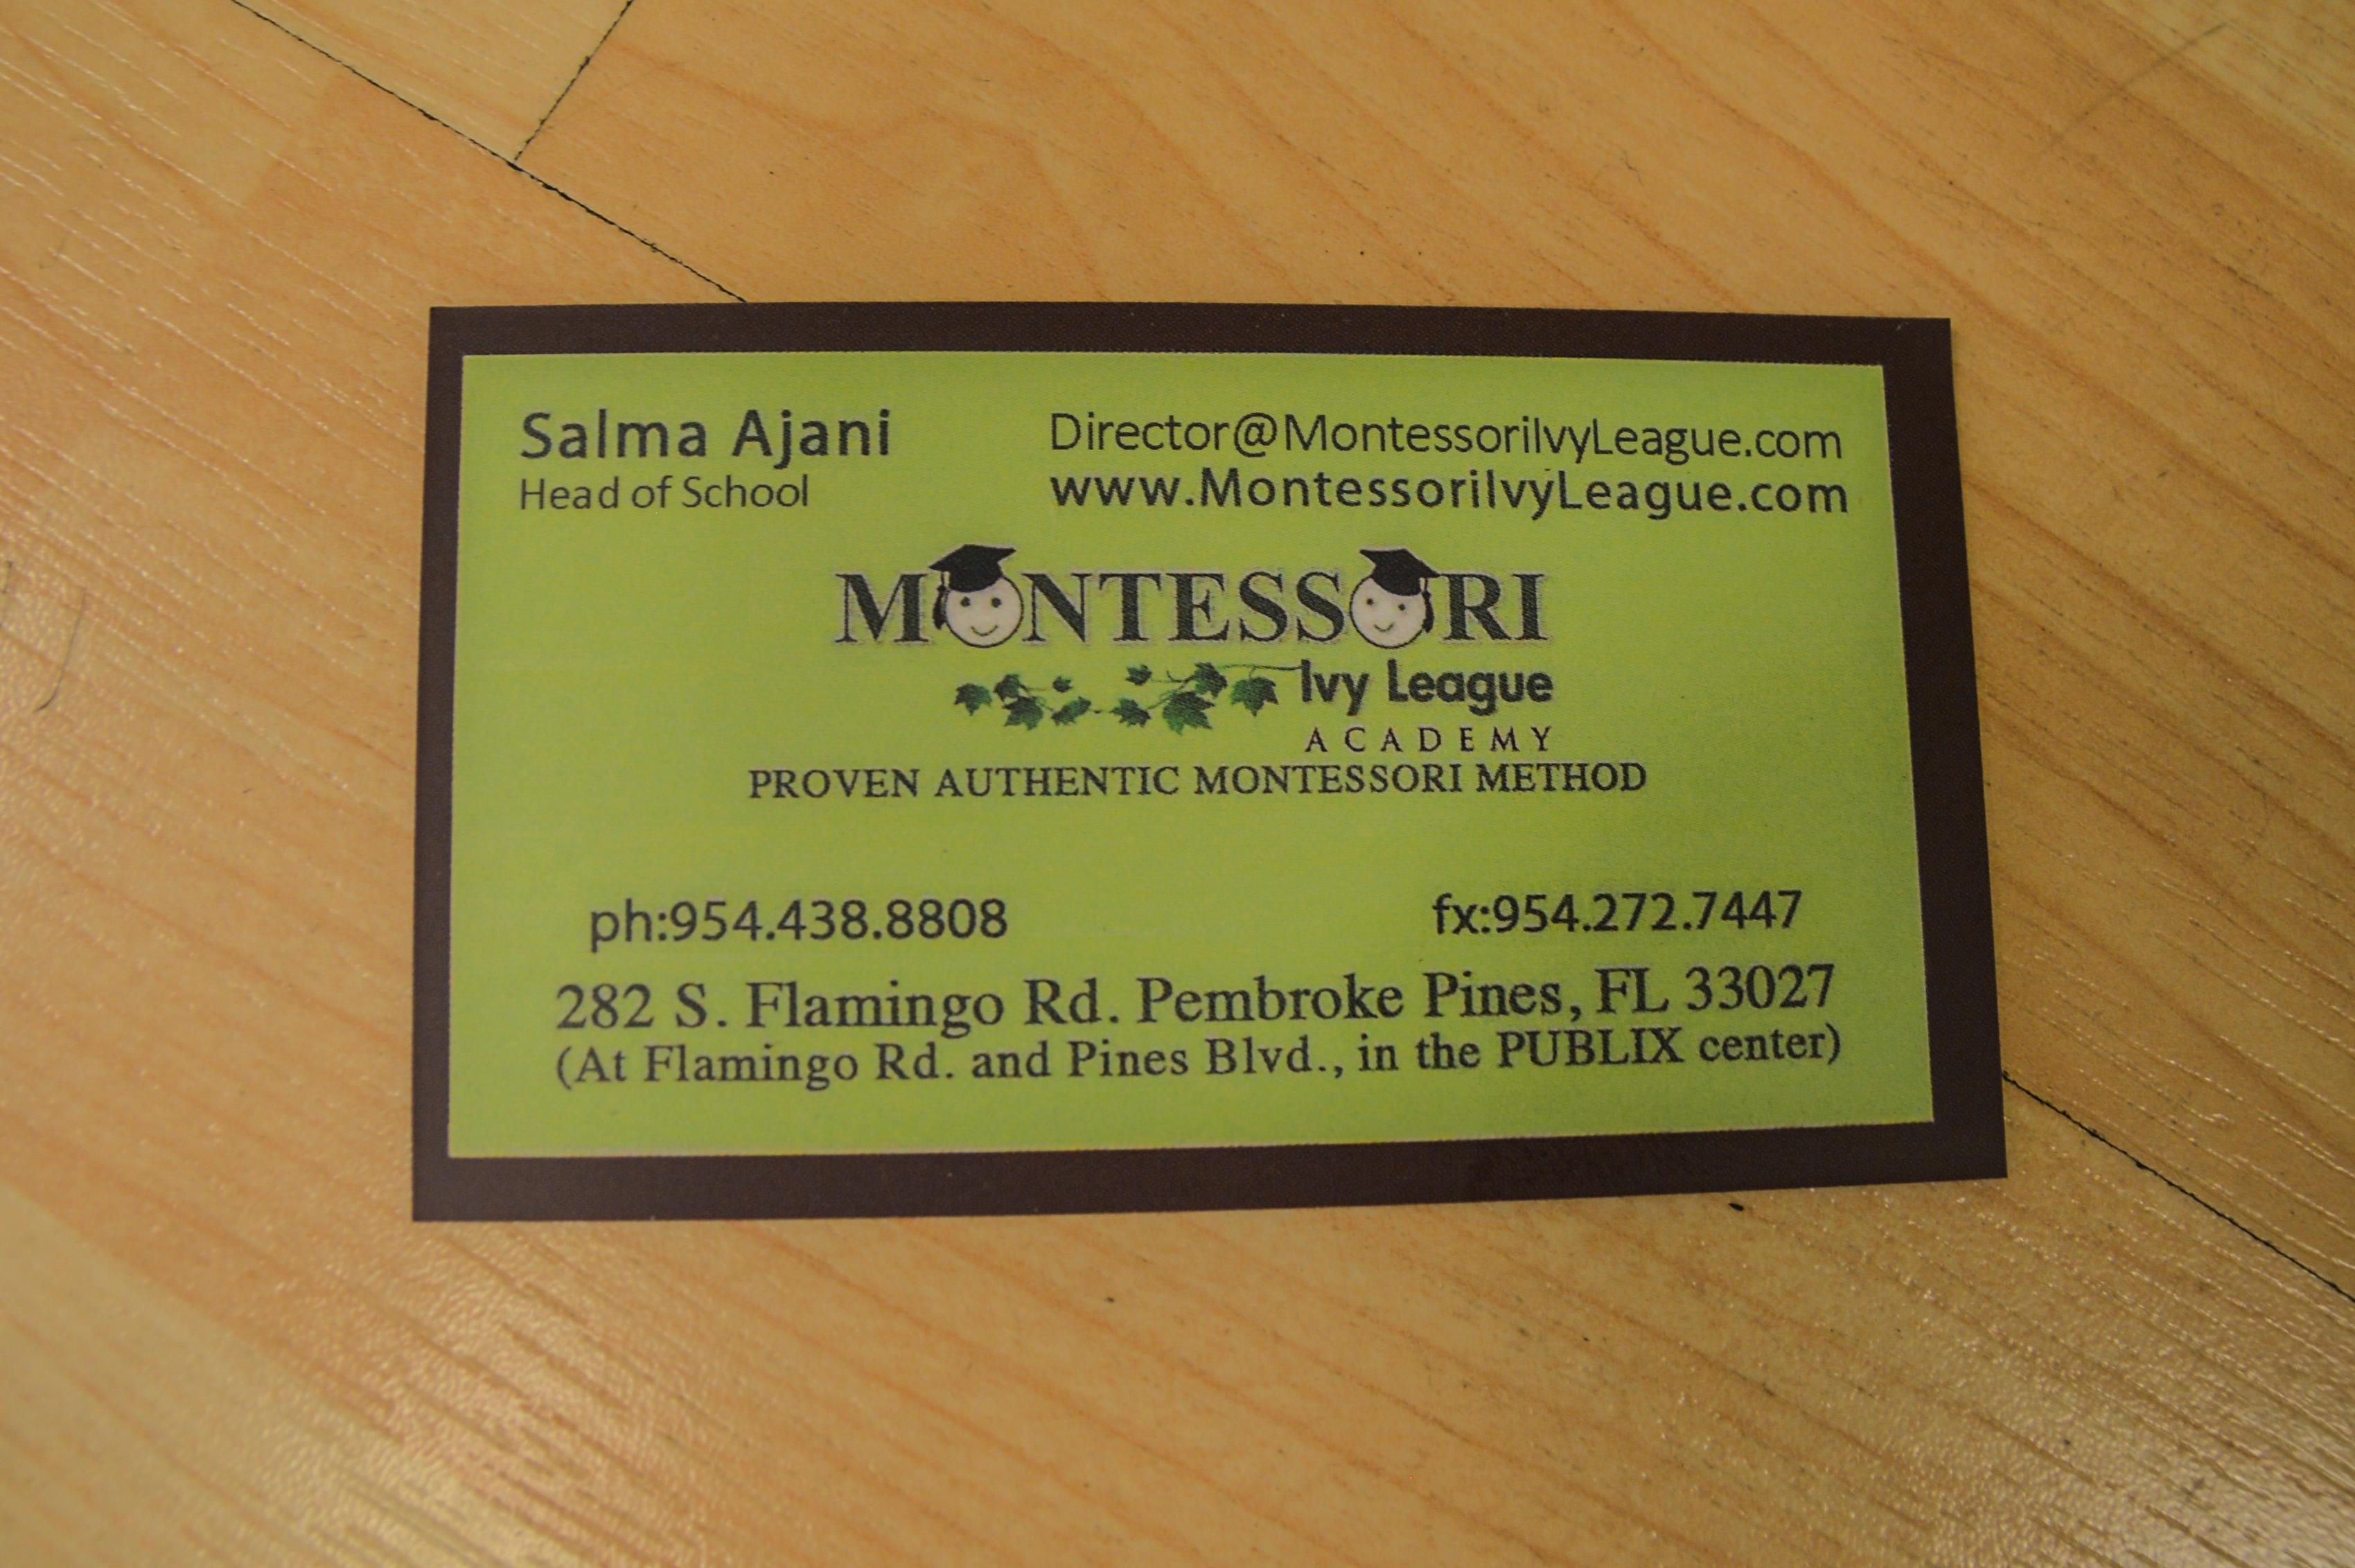 Montessori Ivy League Academy image 4